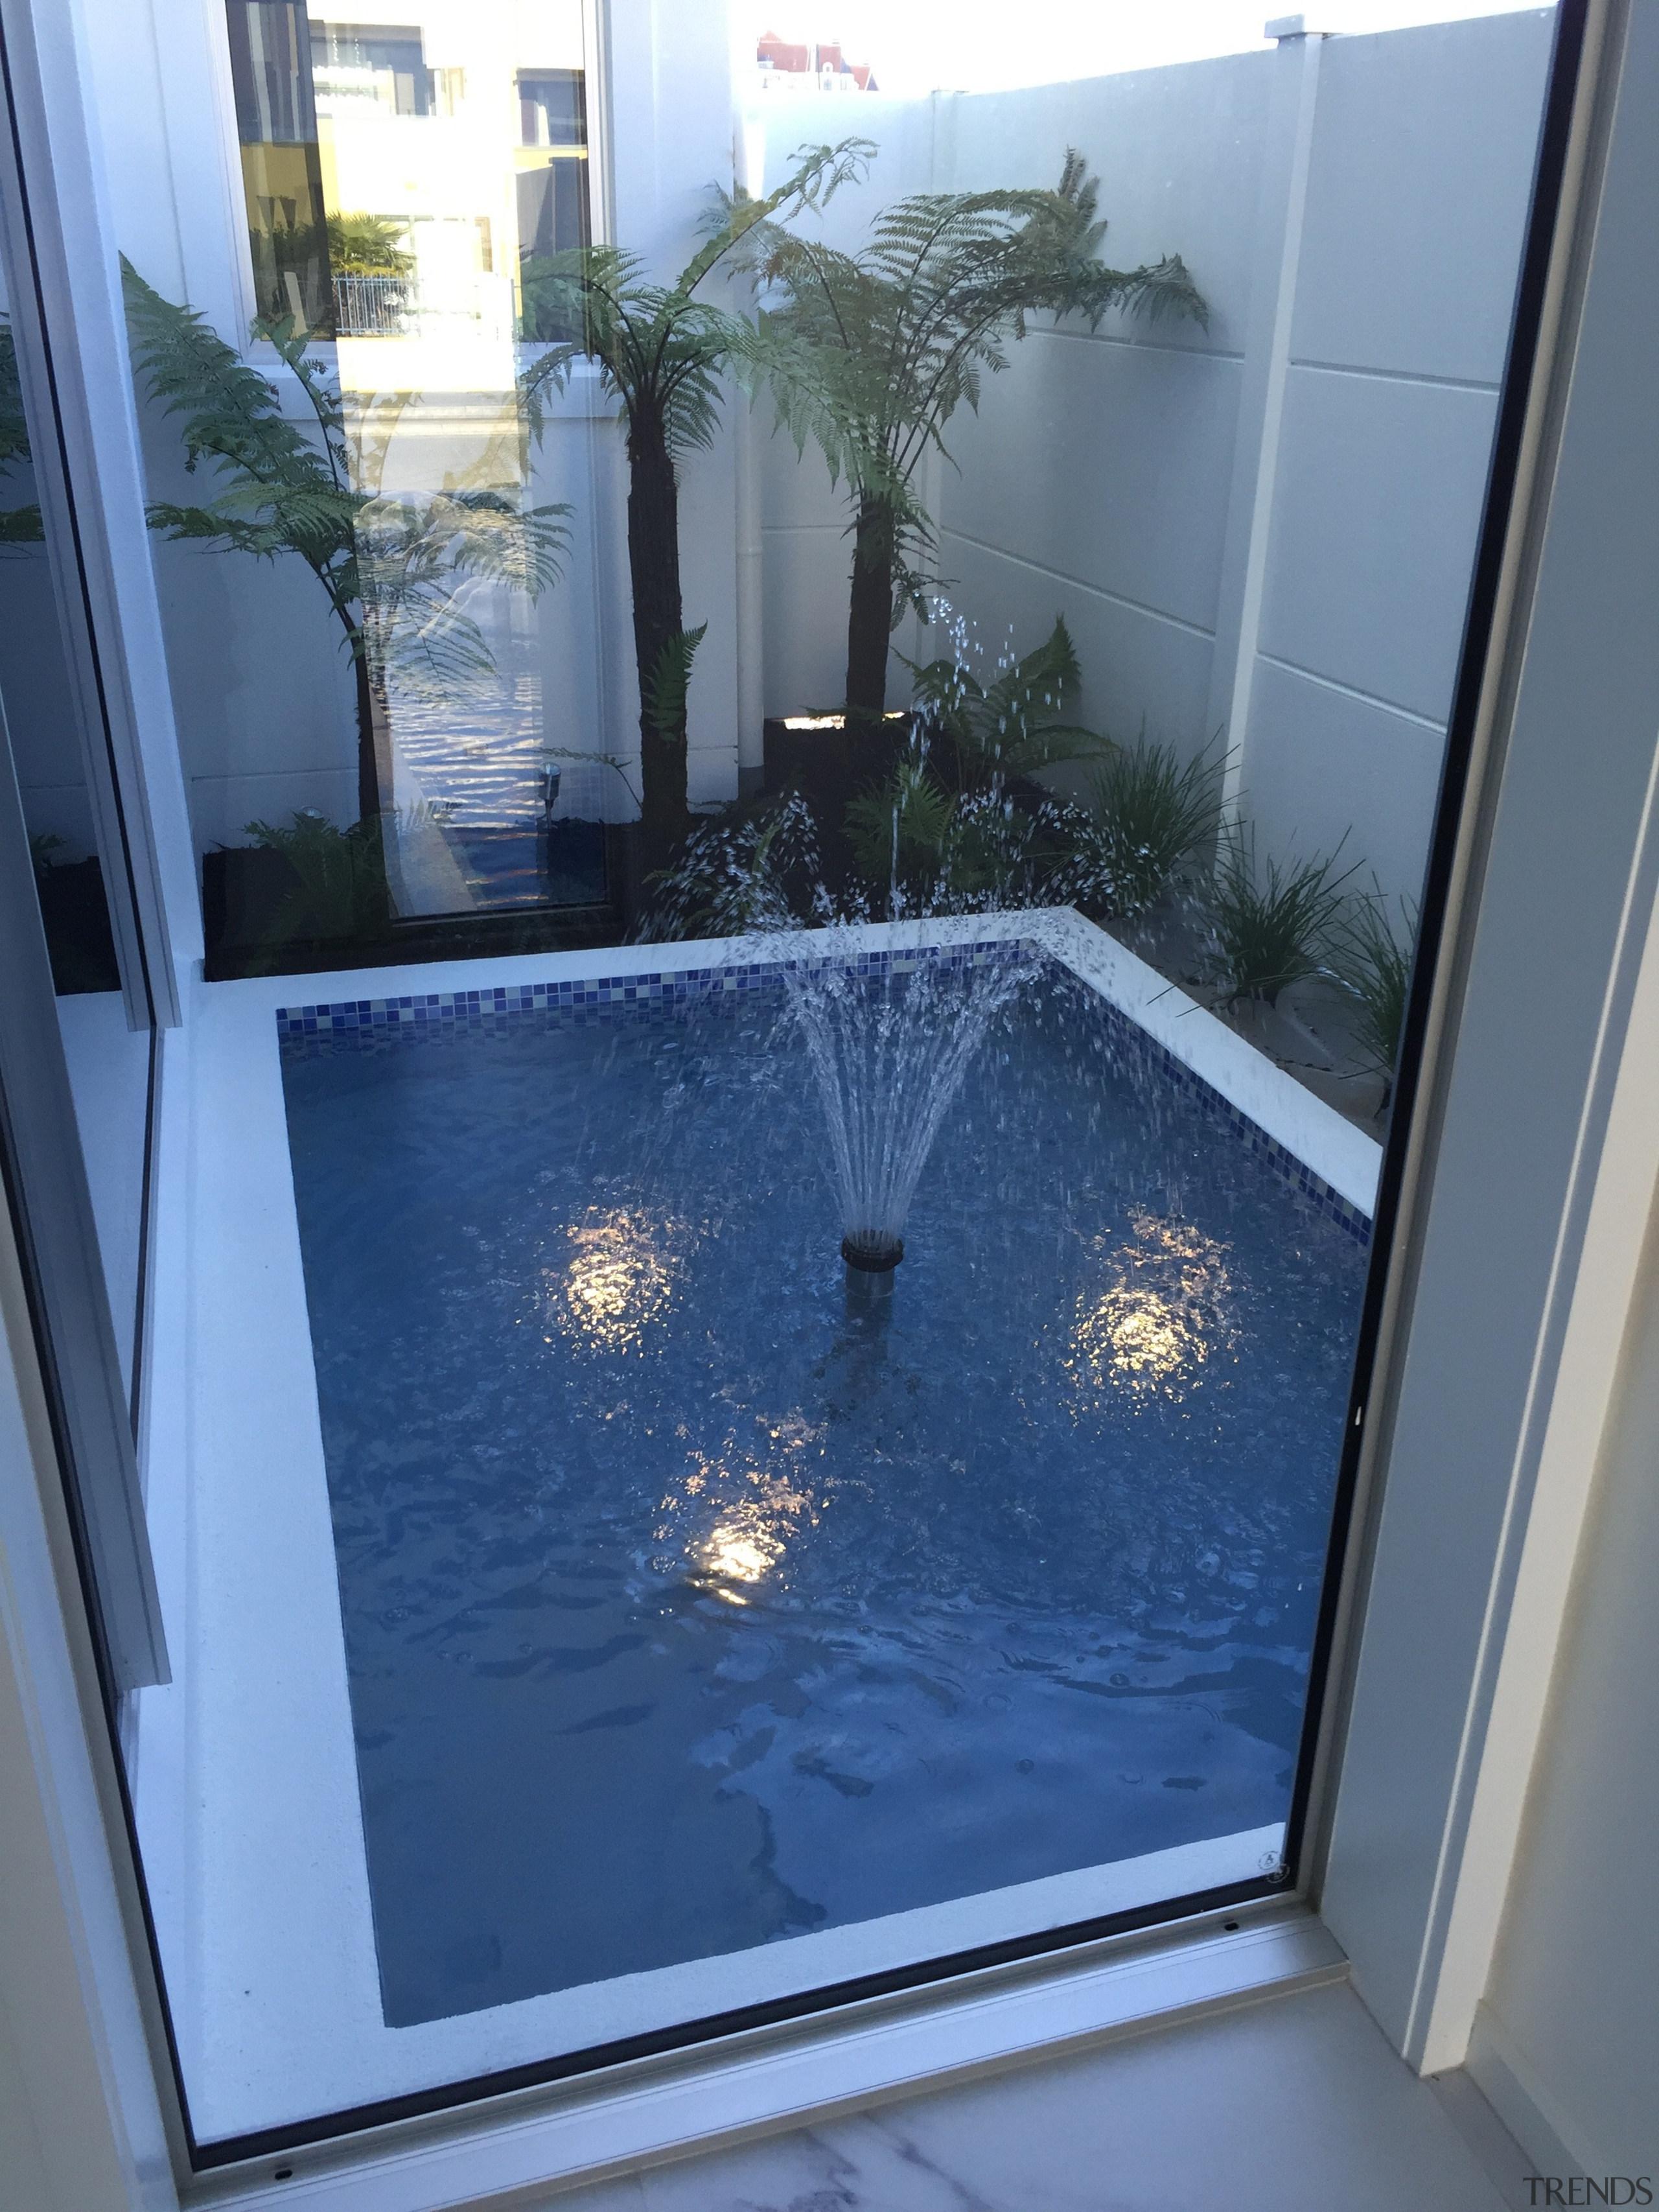 IMG 4 - glass   property   swimming glass, property, swimming pool, water, window, blue